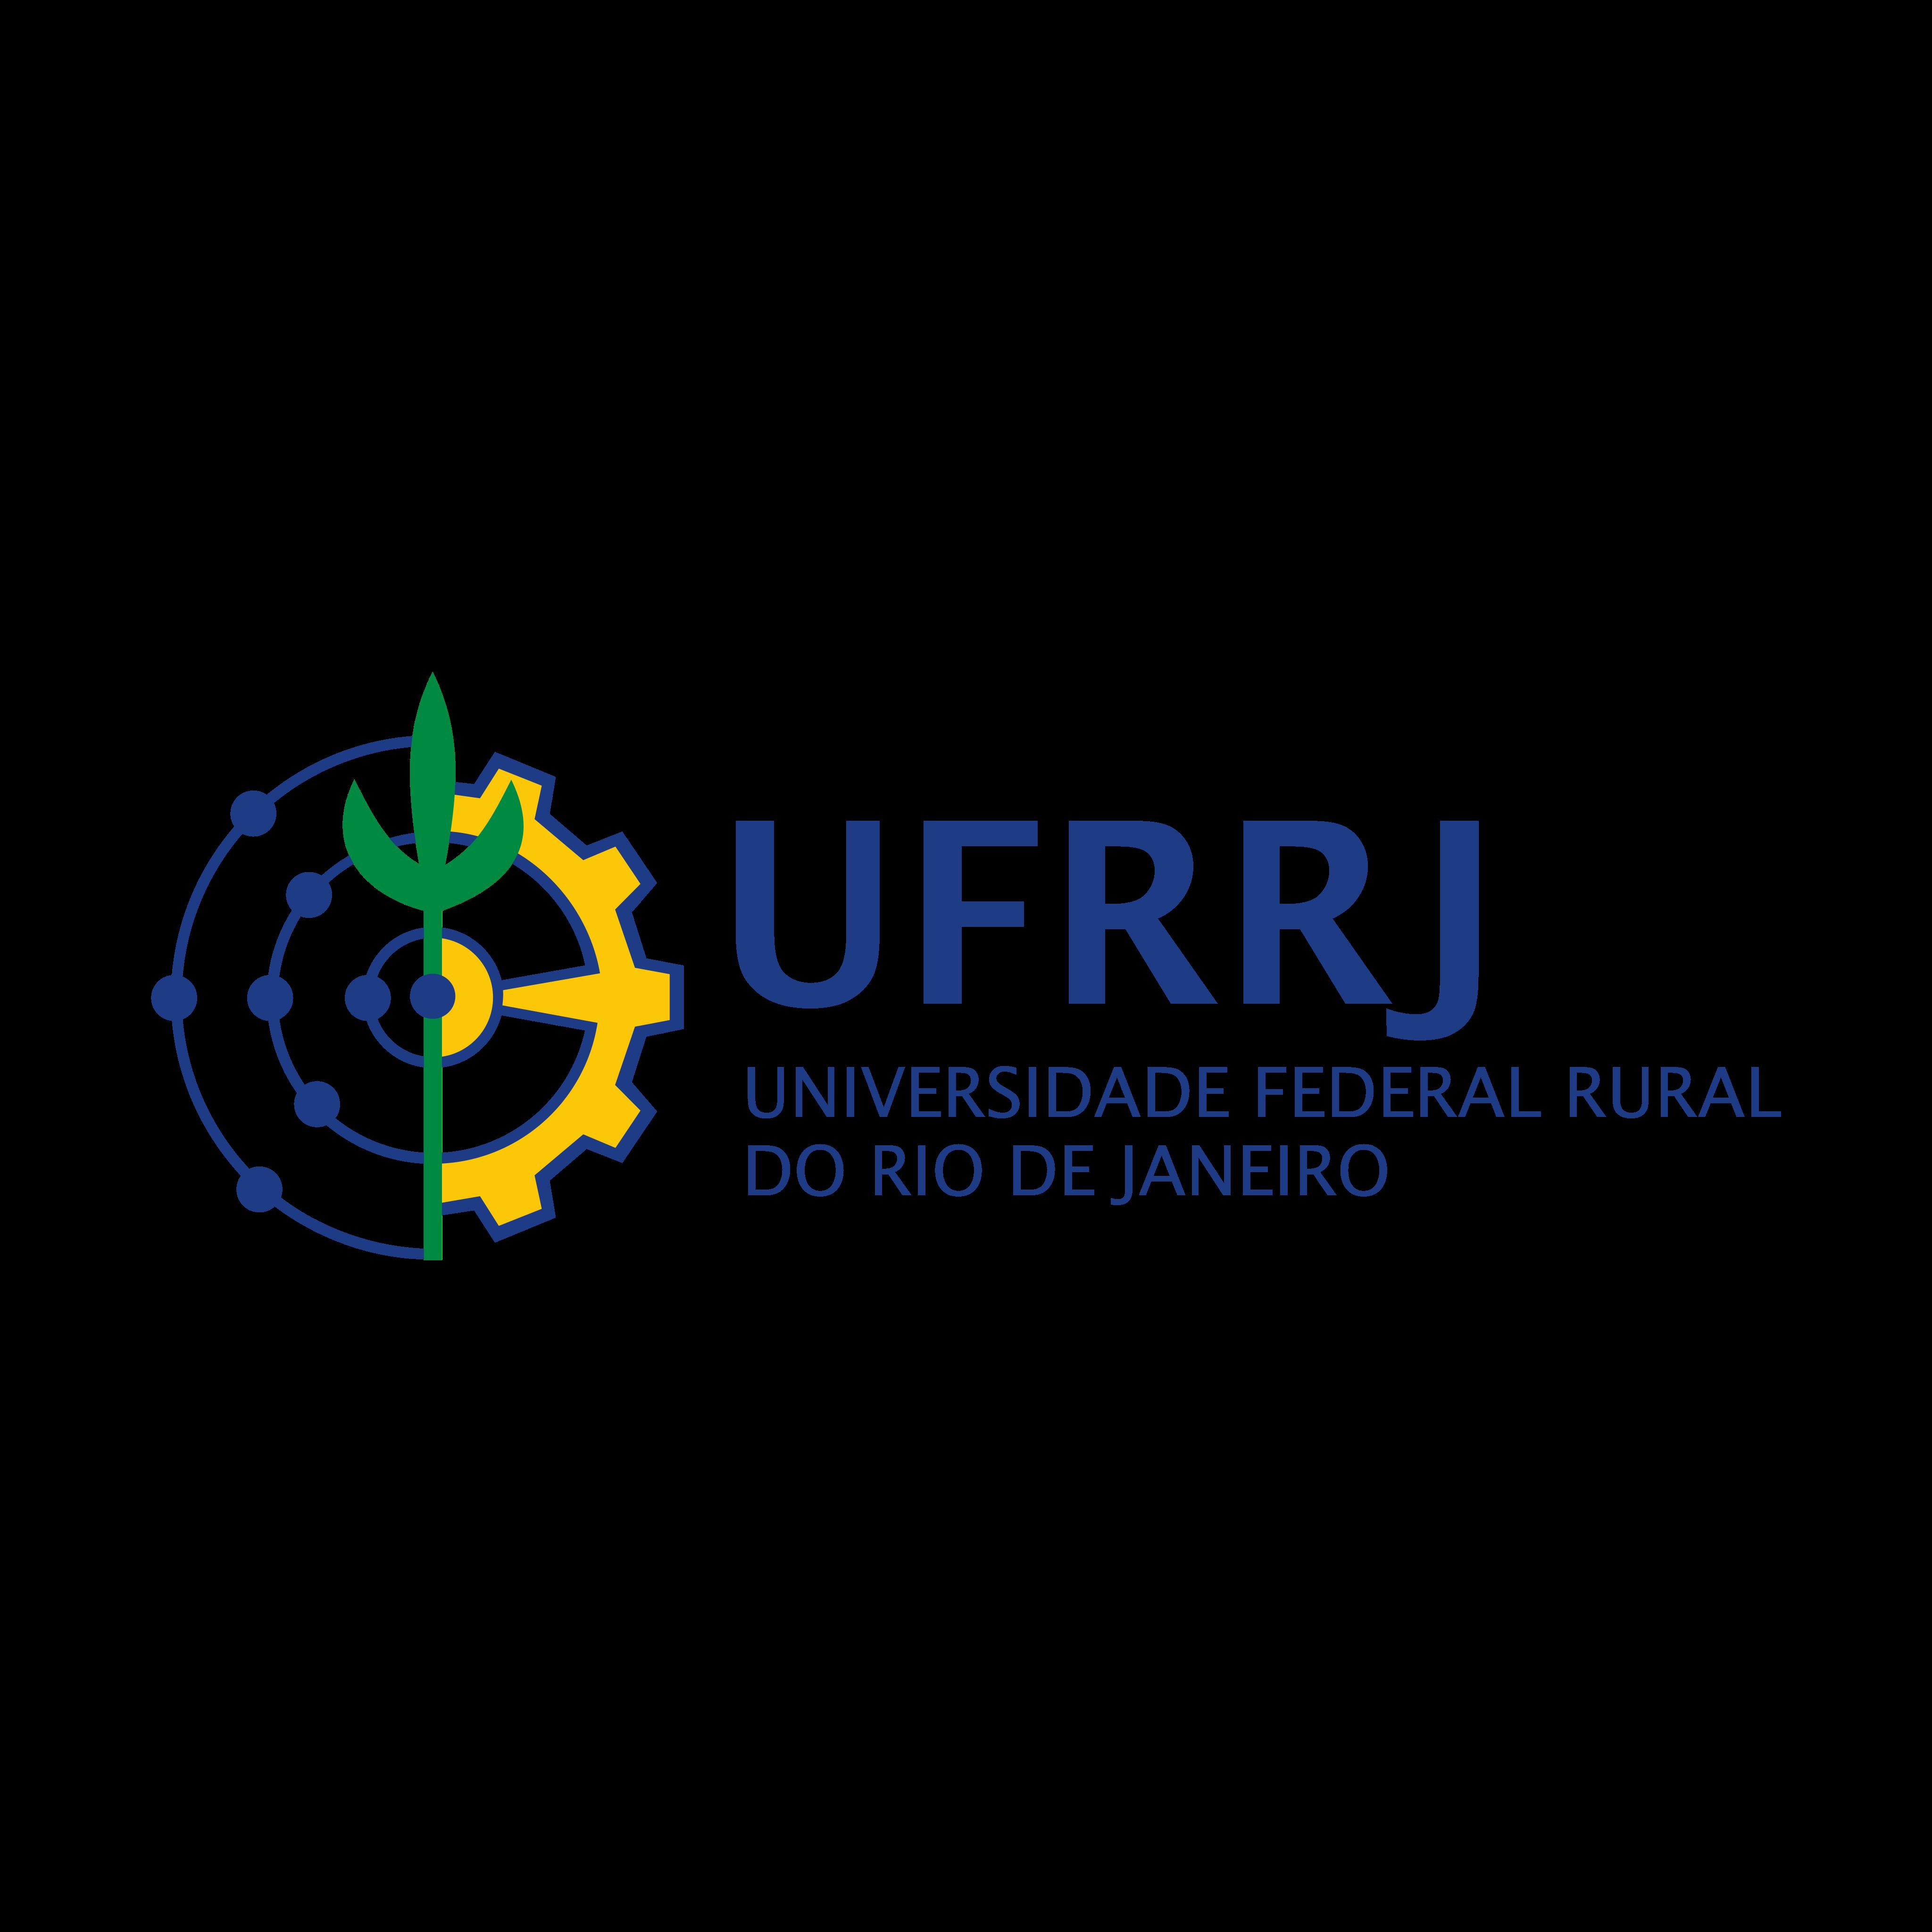 ufrrj logo 0 - UFRRJ Logo